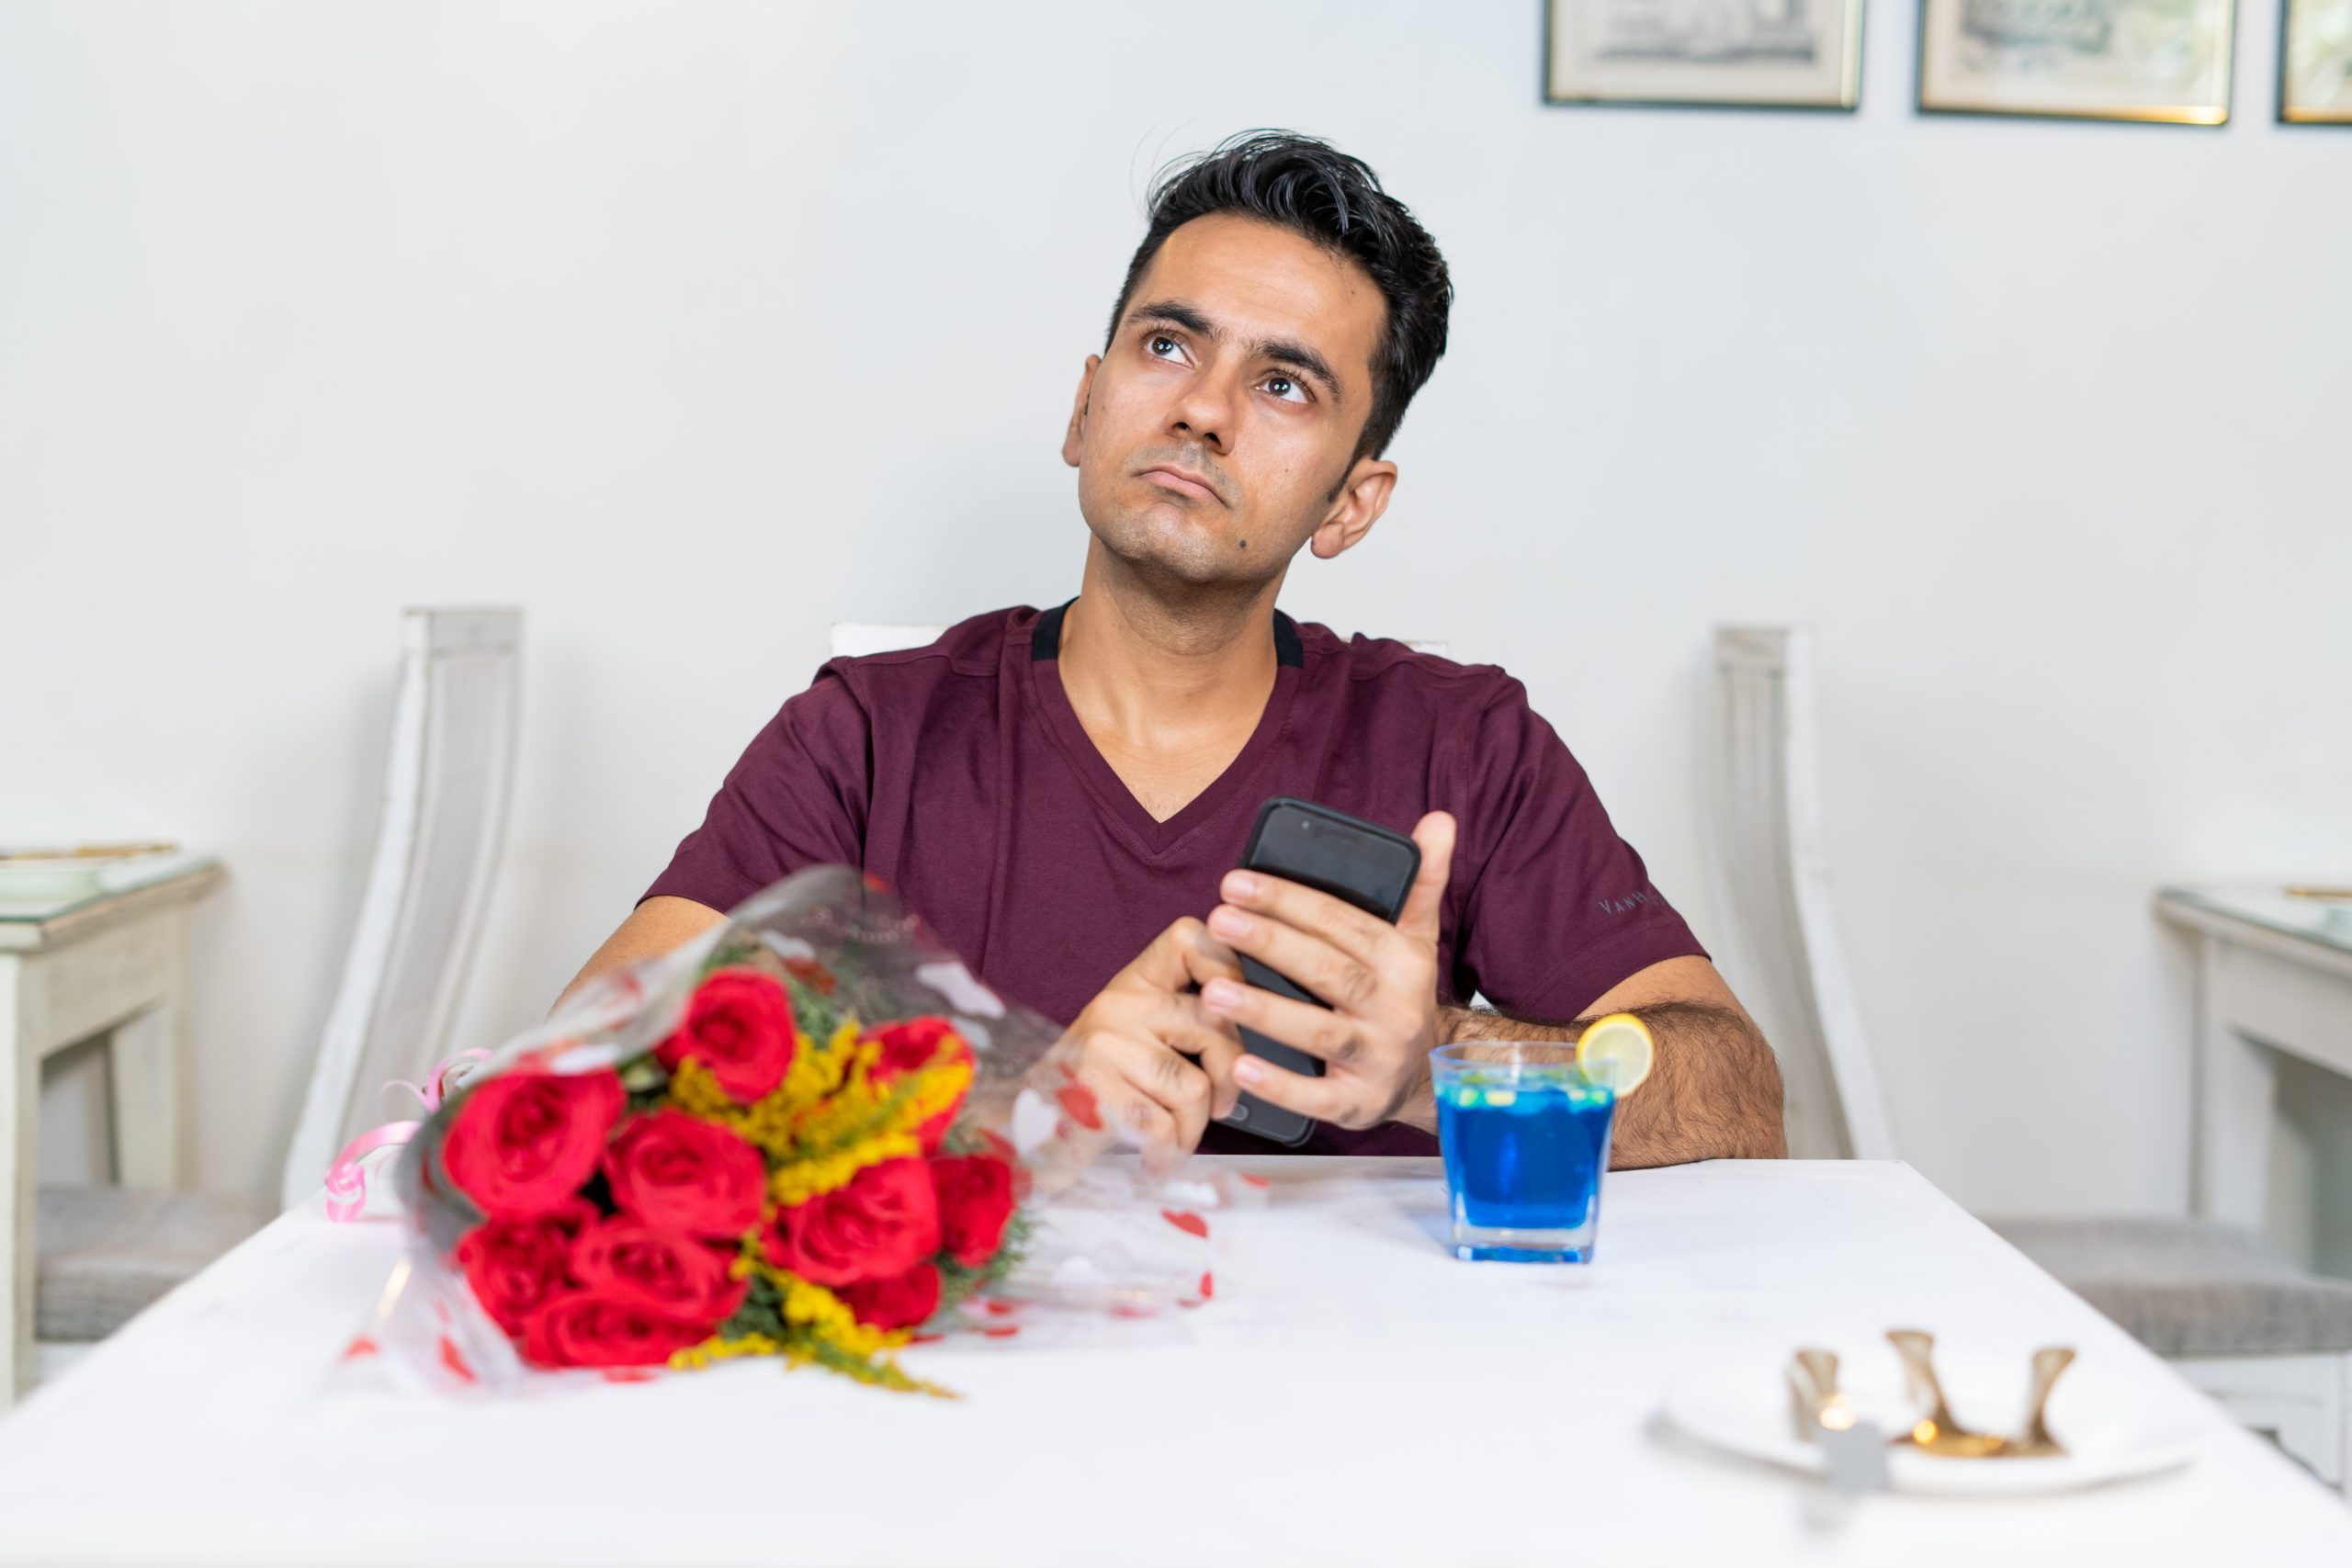 Boy waiting for his girlfriend in restaurant